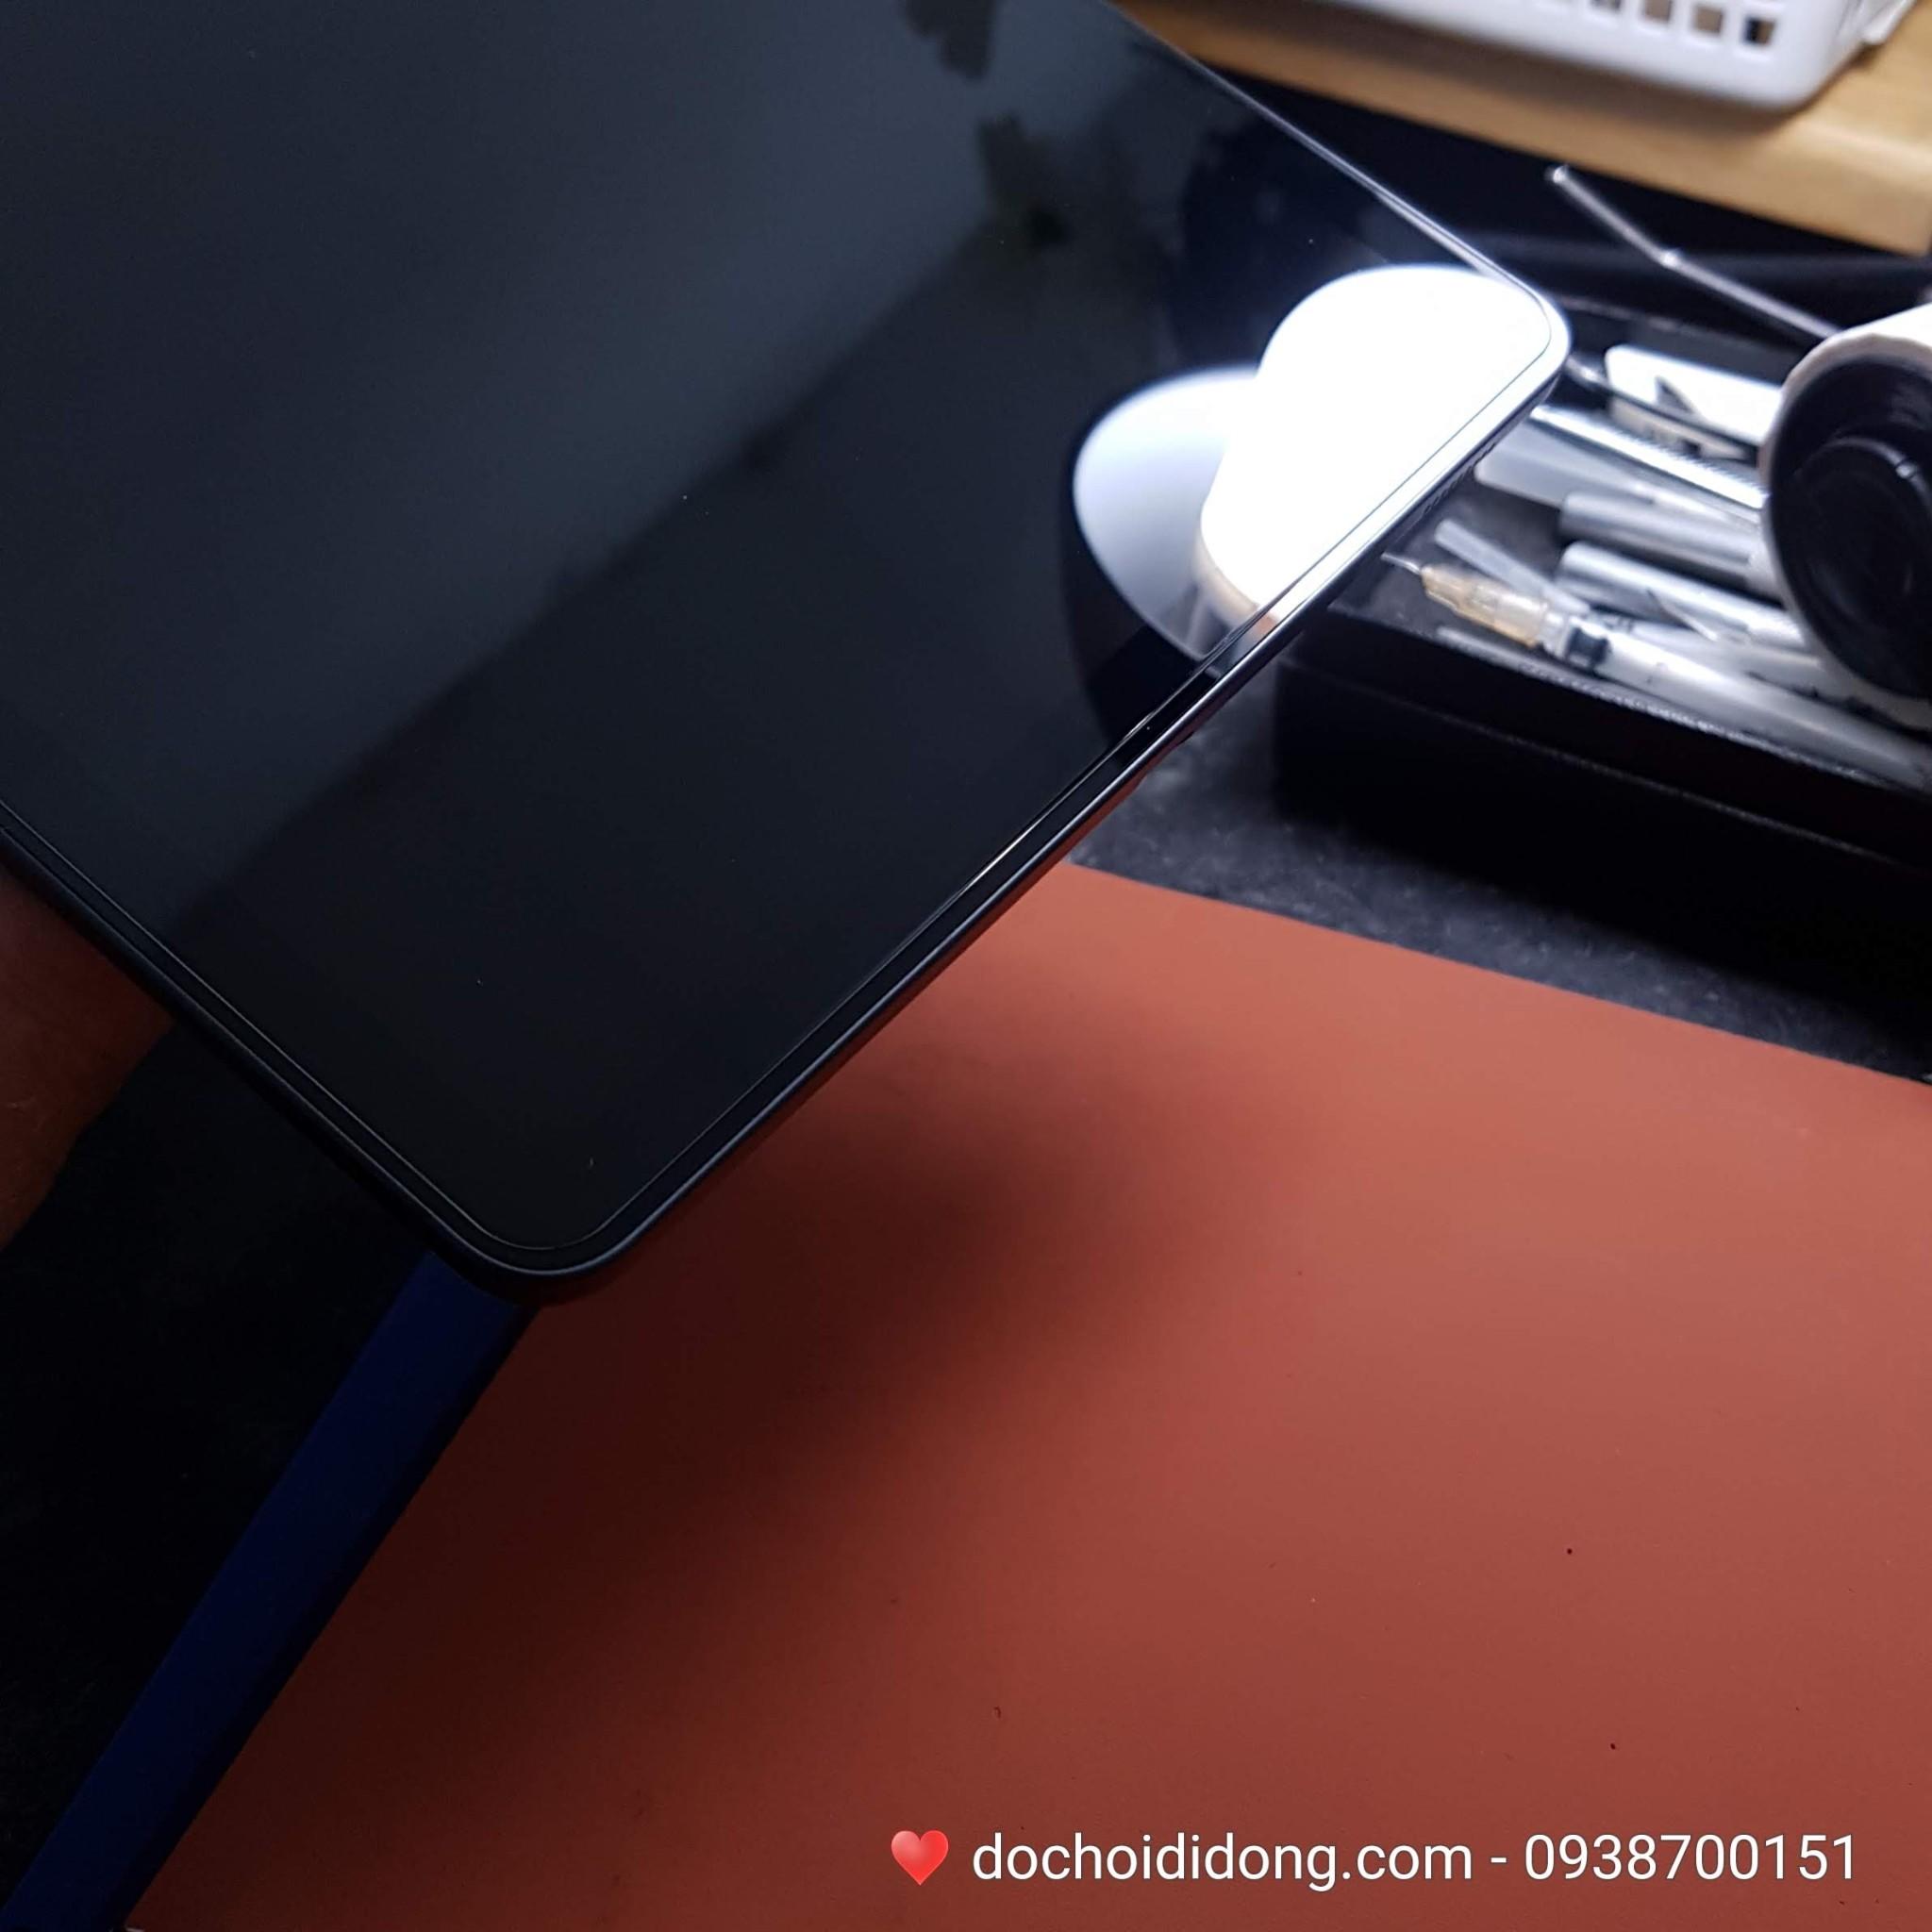 mieng-dan-cuong-luc-samsung-galaxy-tab-s6-lite-zacase-tablet-premium